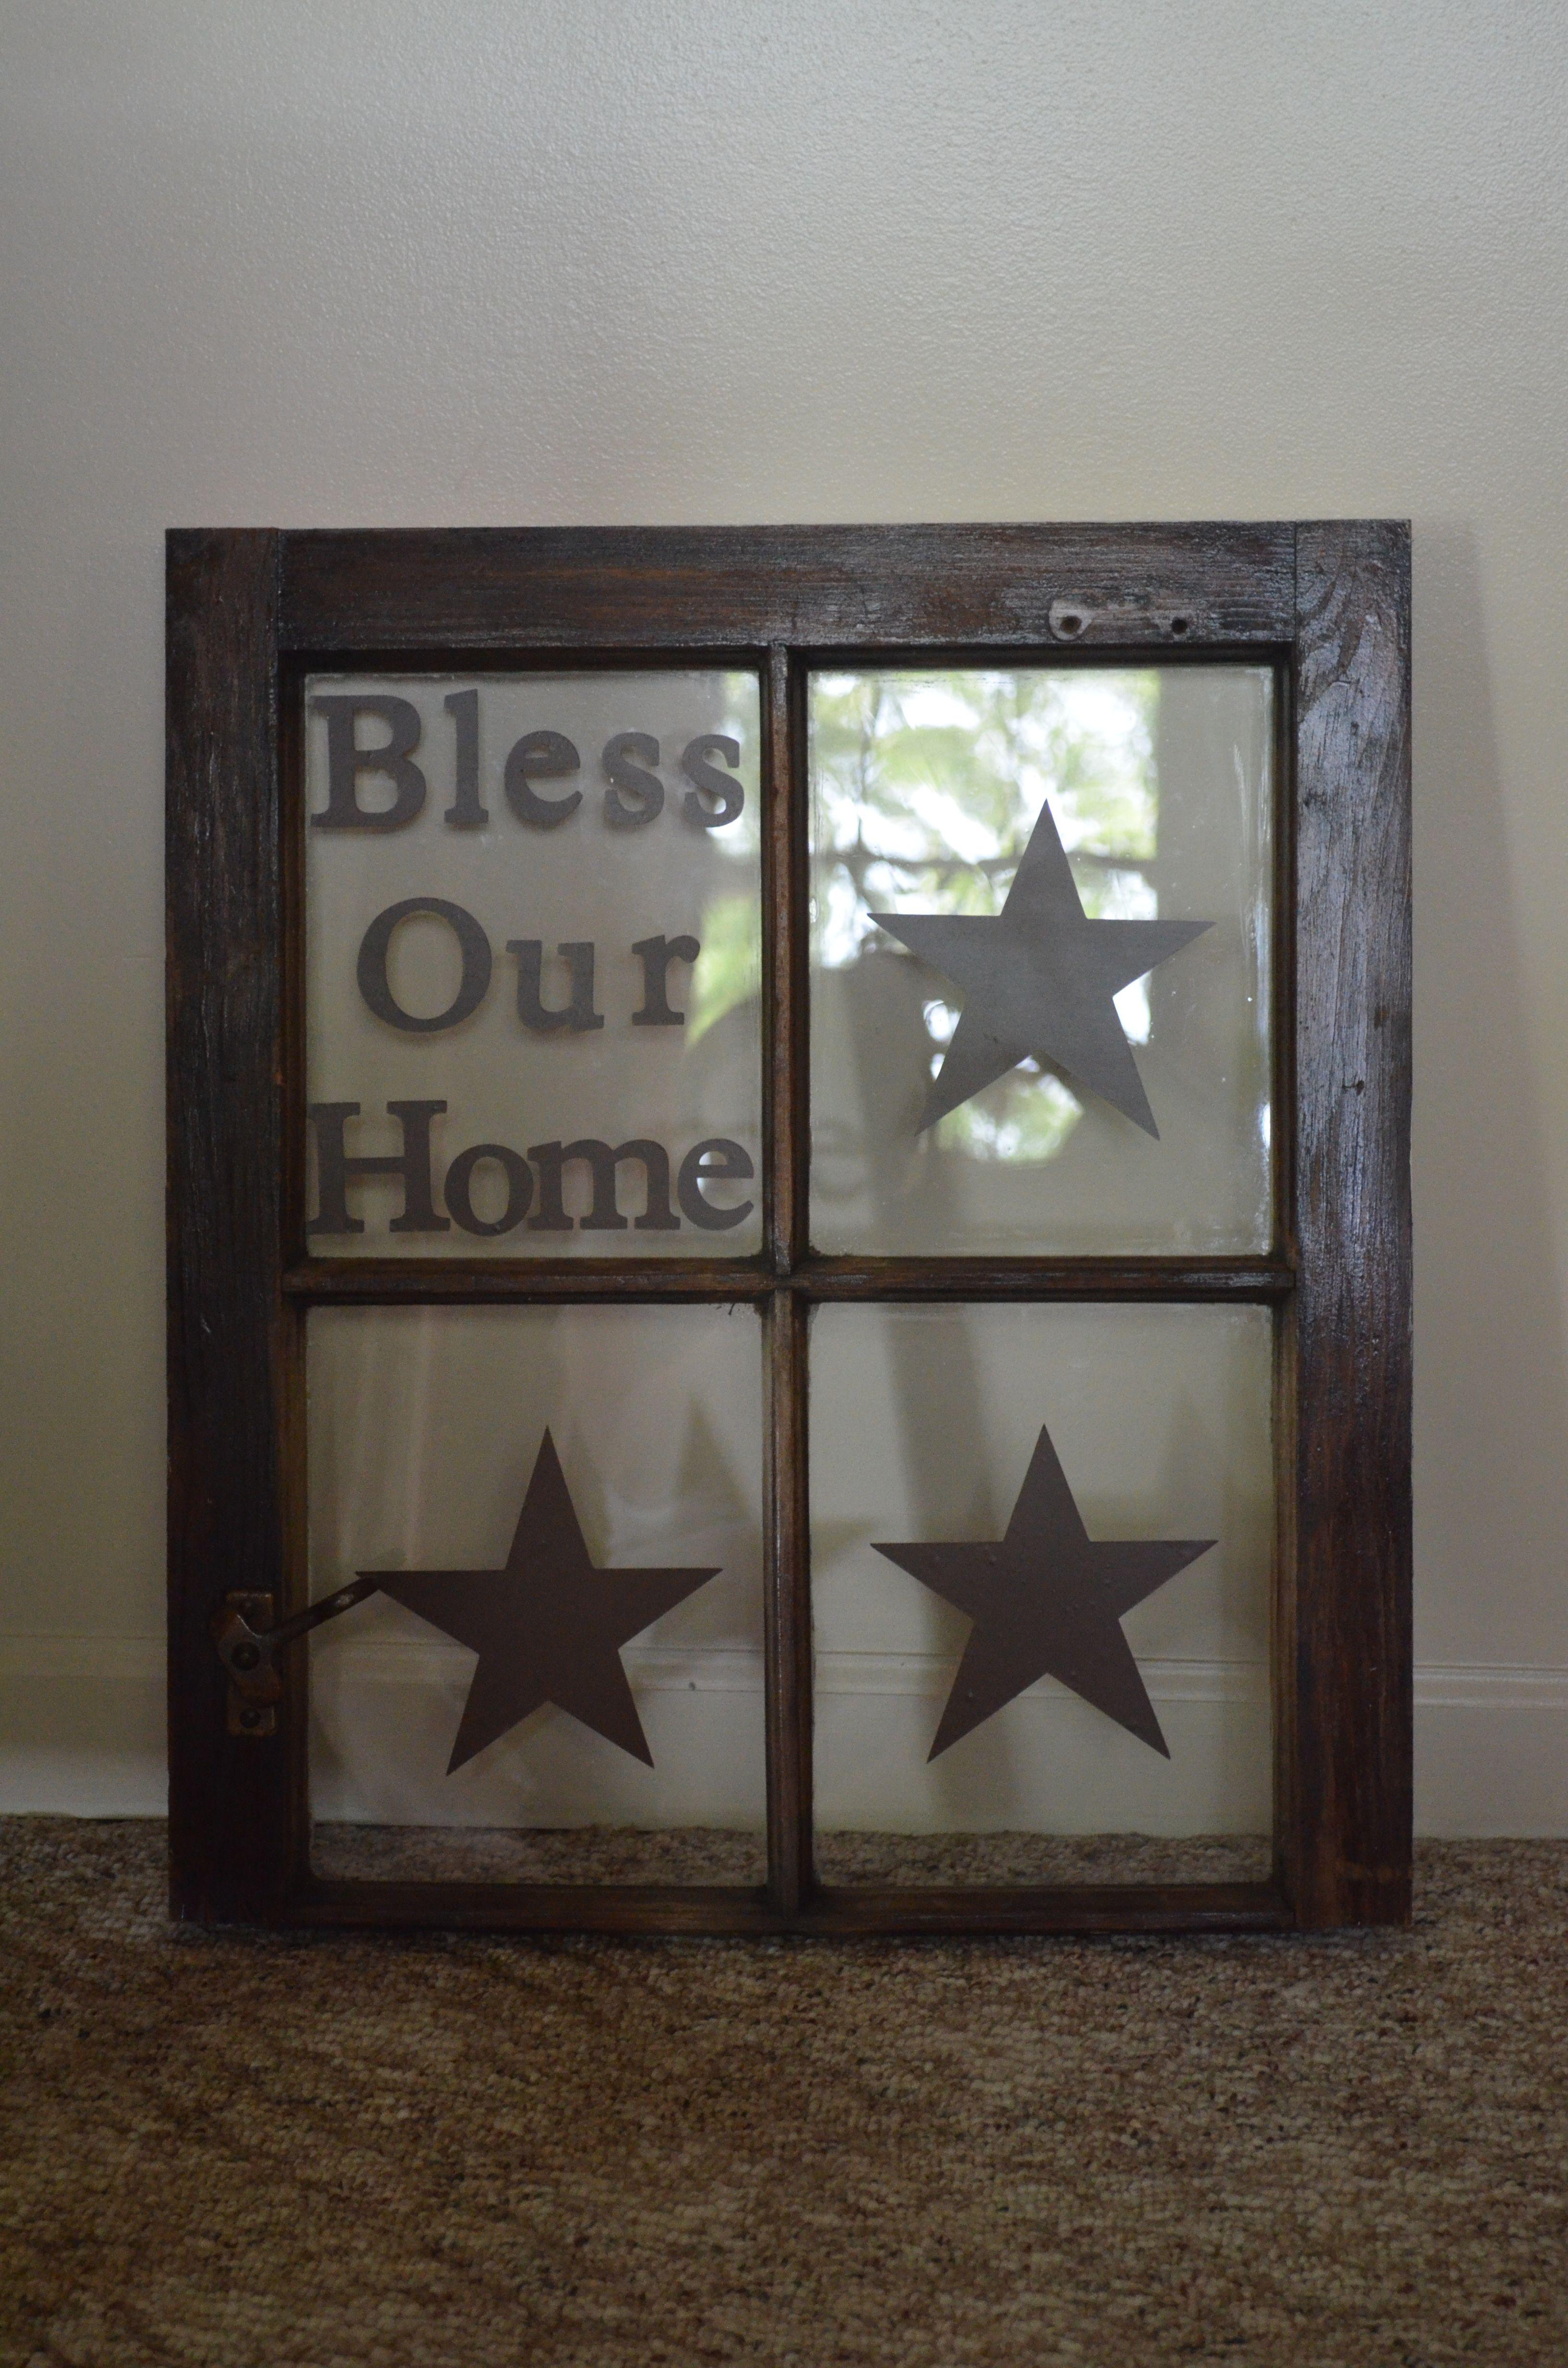 House wooden window design  repurposed old window designs  craft ideas  pinterest  window